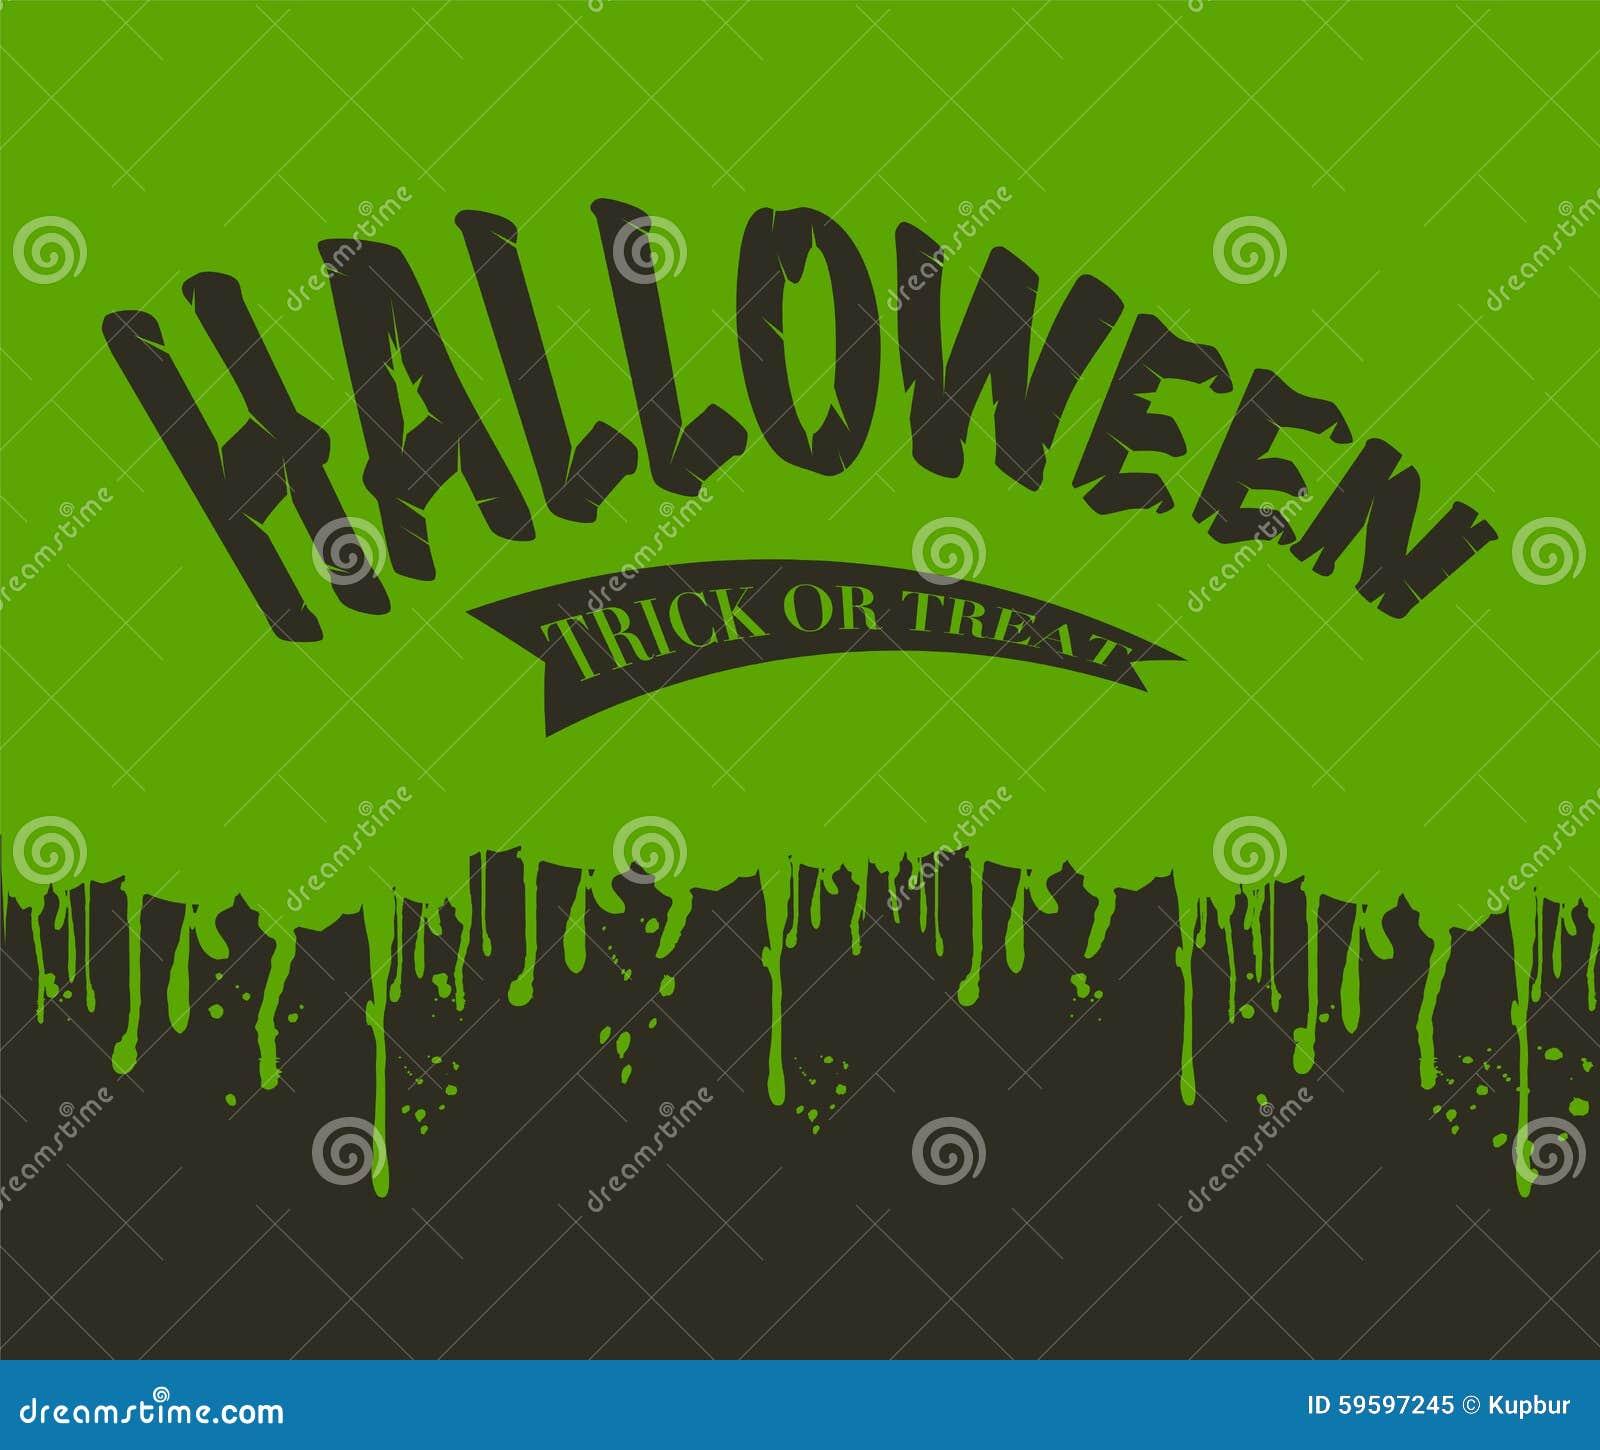 Oozing Slime Halloween